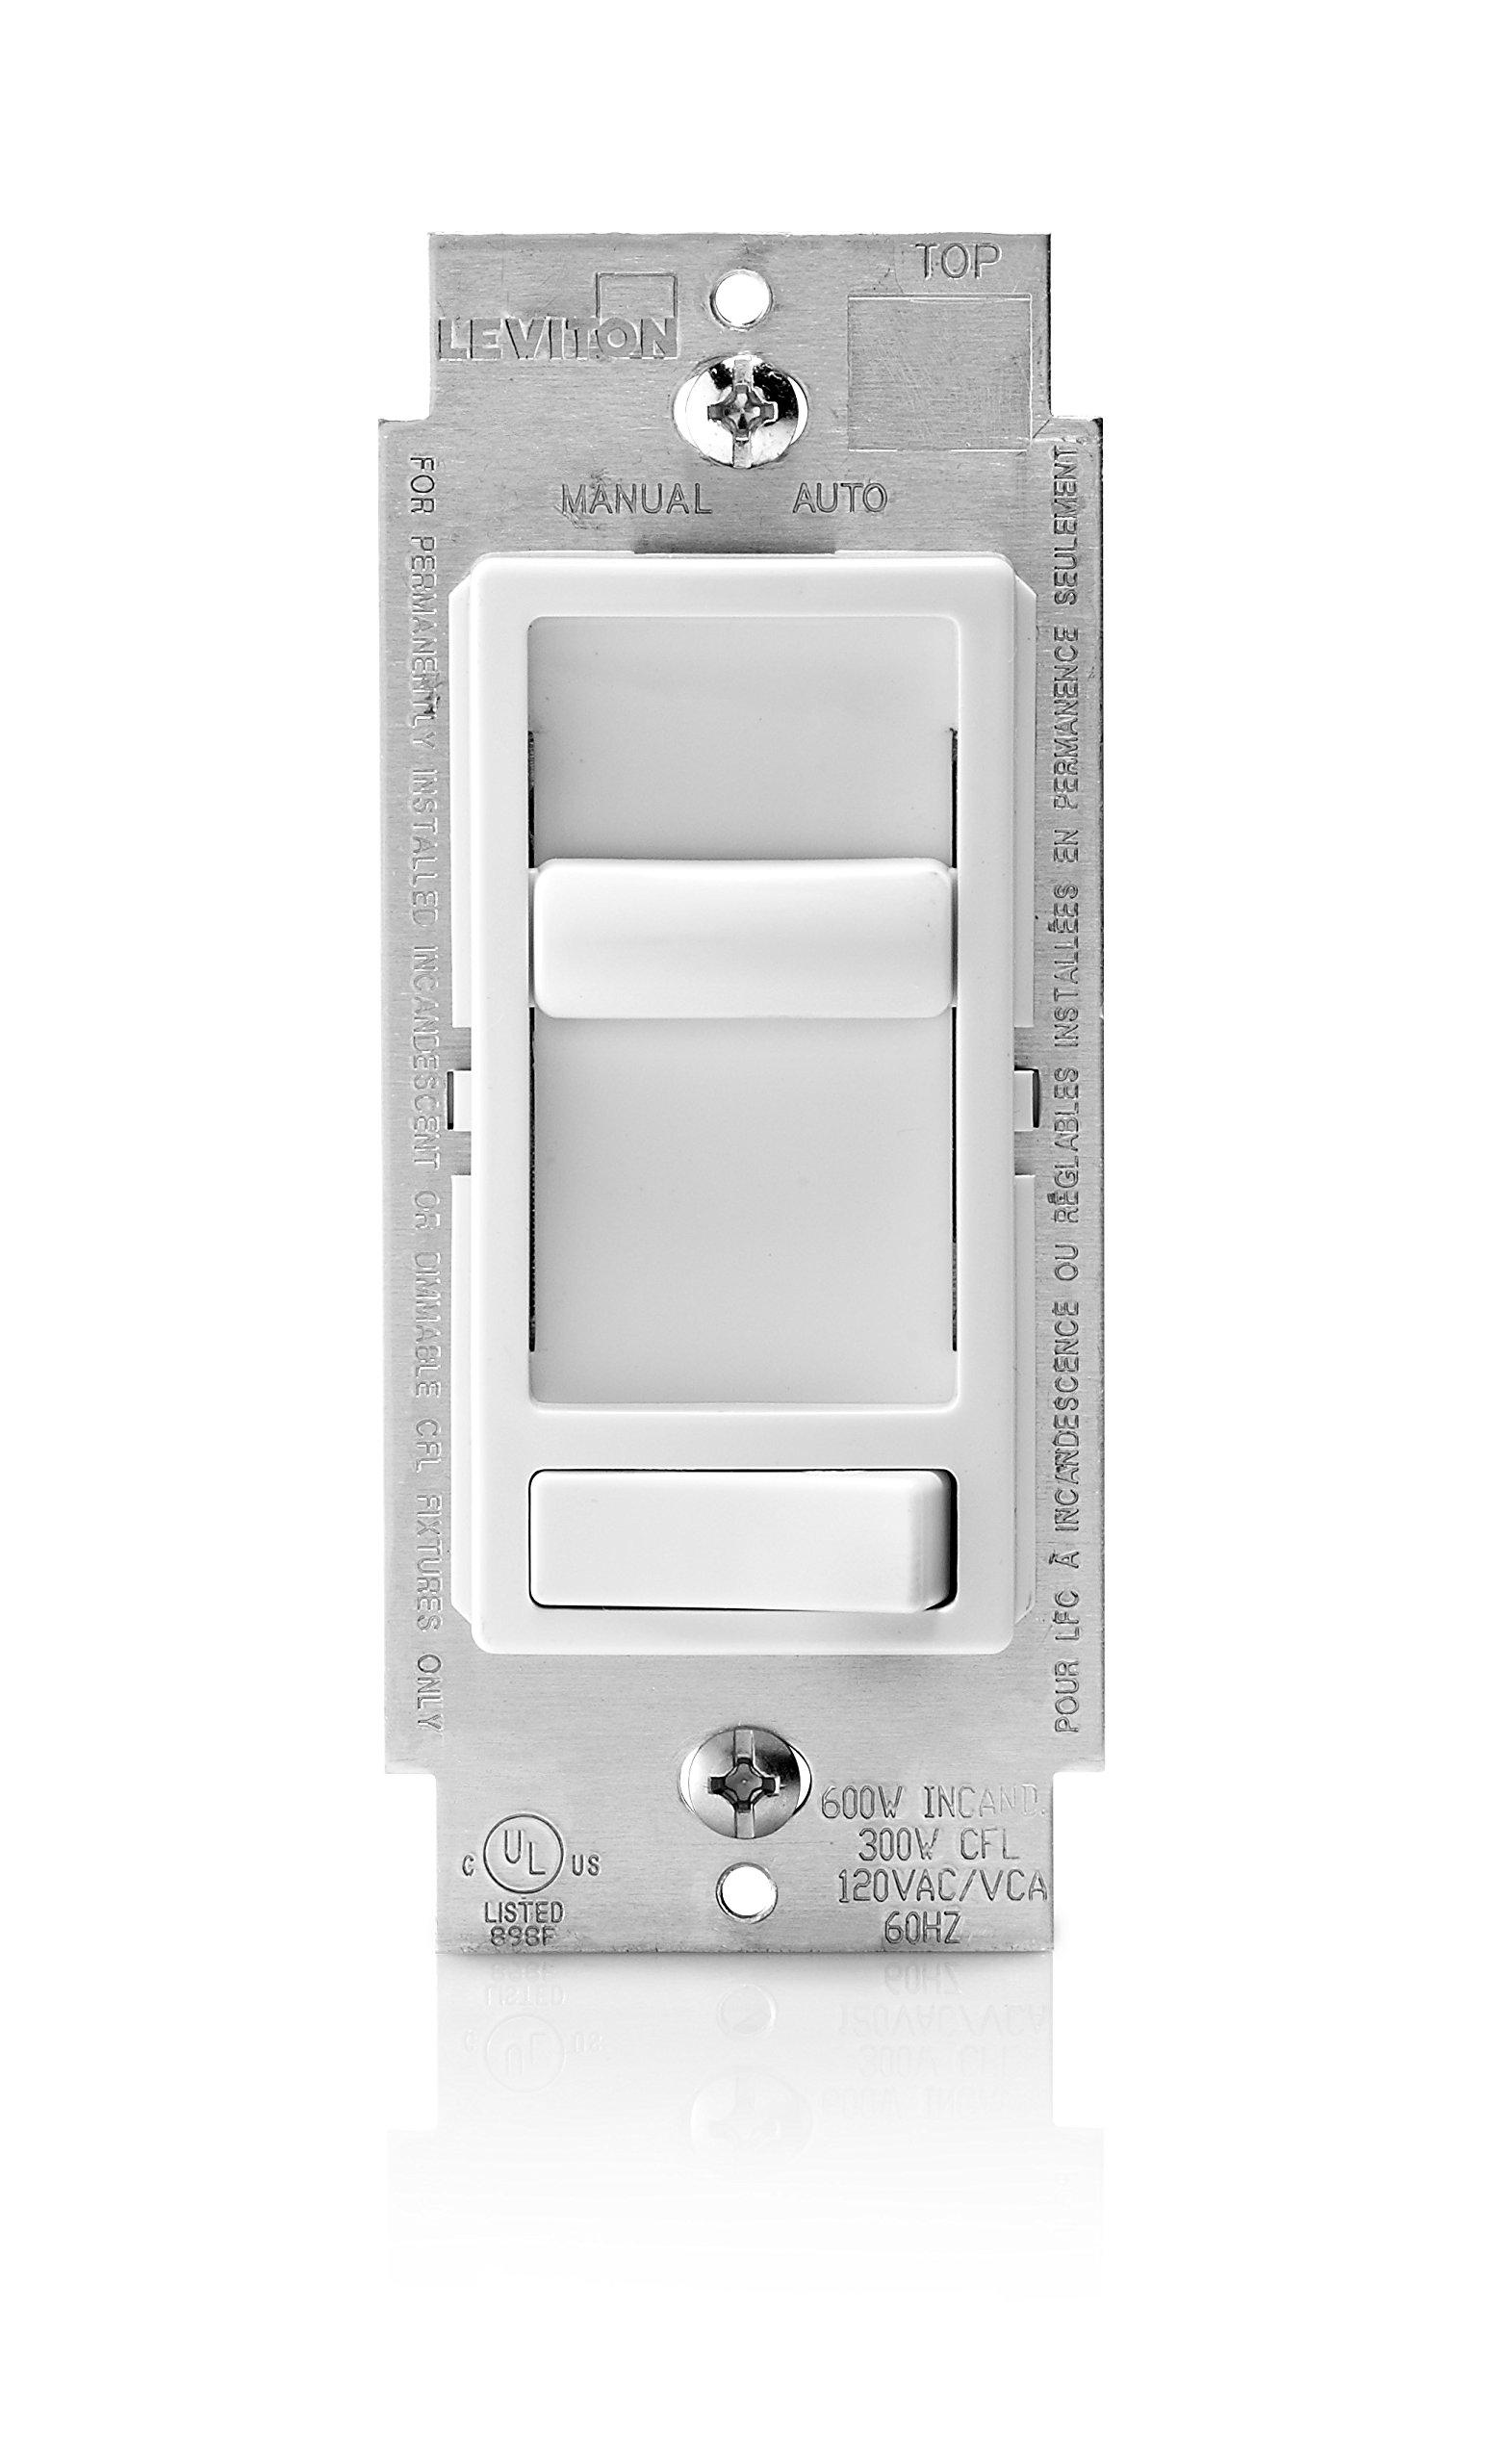 Leviton 6674-P0W SureSlide Universal 150-Watt LED and CFL/600-Watt Incandescent Dimmer, White by Leviton